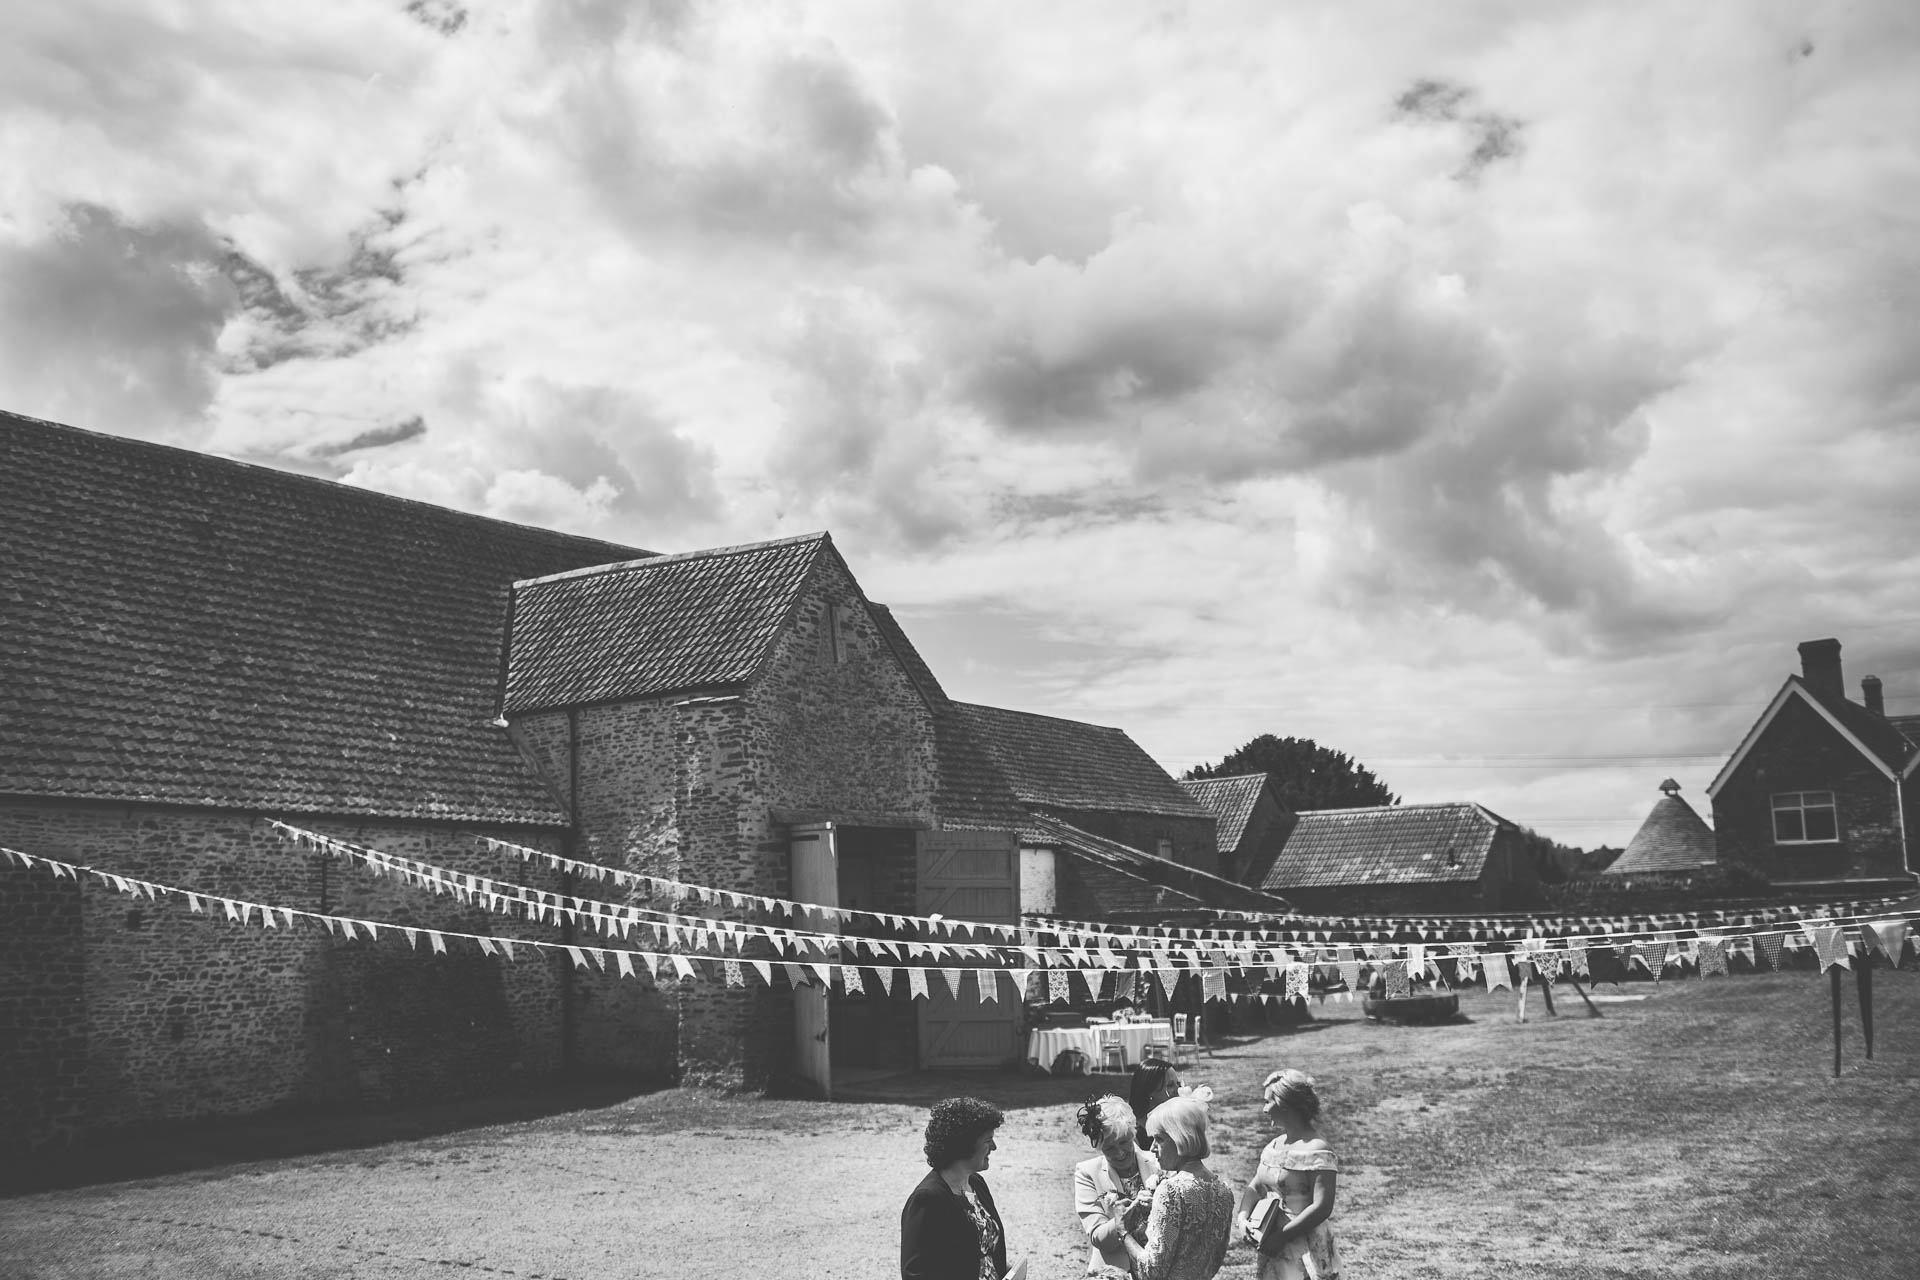 winterbourne-medieval-barn-wedding-photography-emma-andrew-34